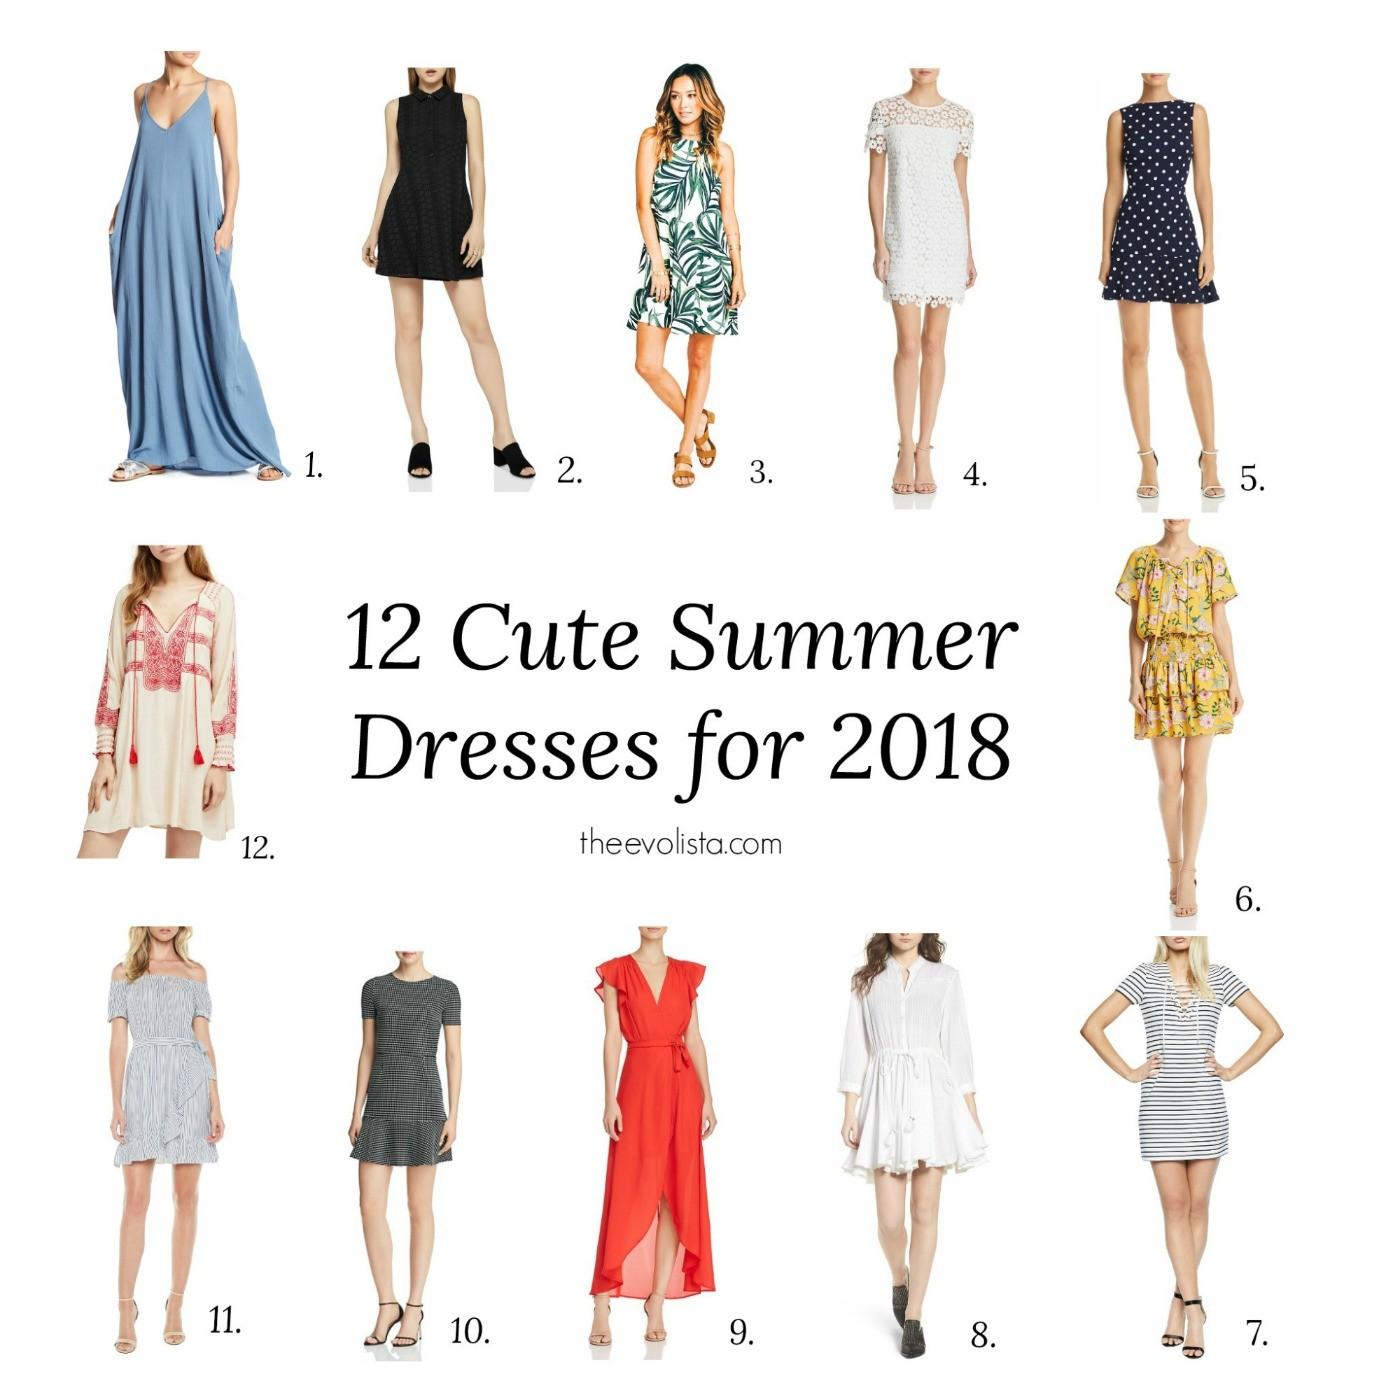 9a069a8384 12 Cute Dresses for Summer 2018 - THE EVOLISTA